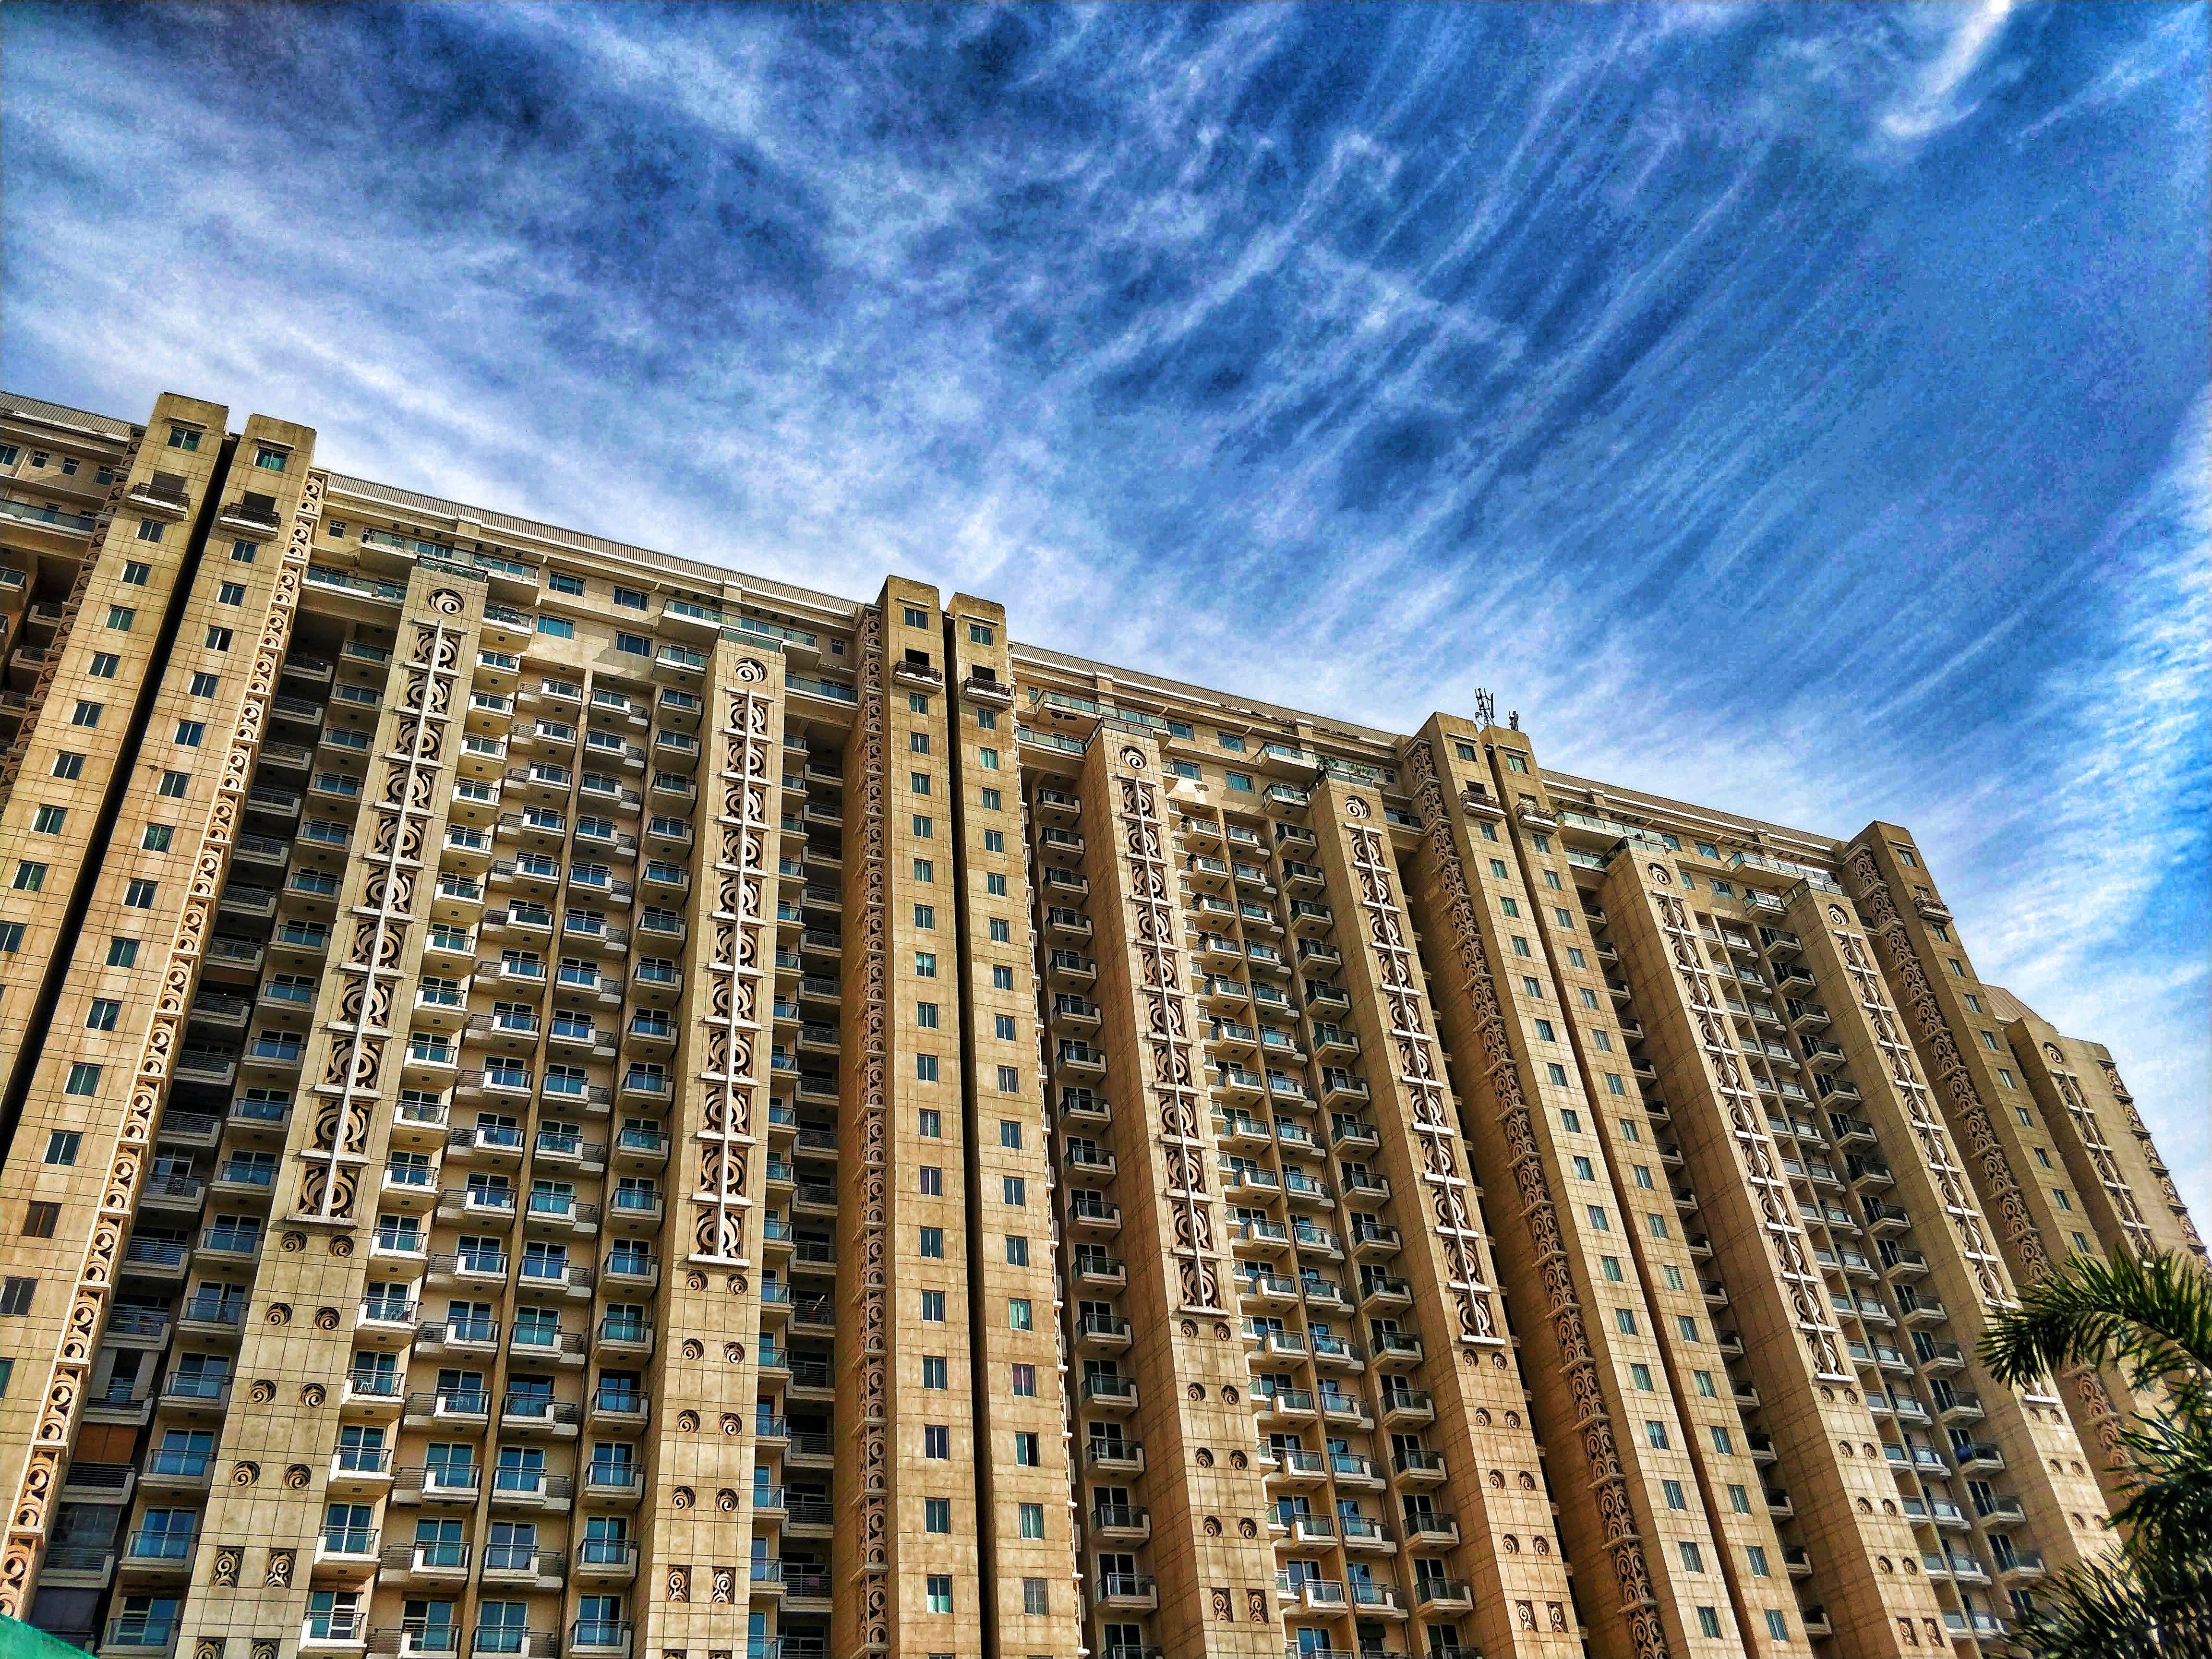 apartments, architektur, architekturdesign